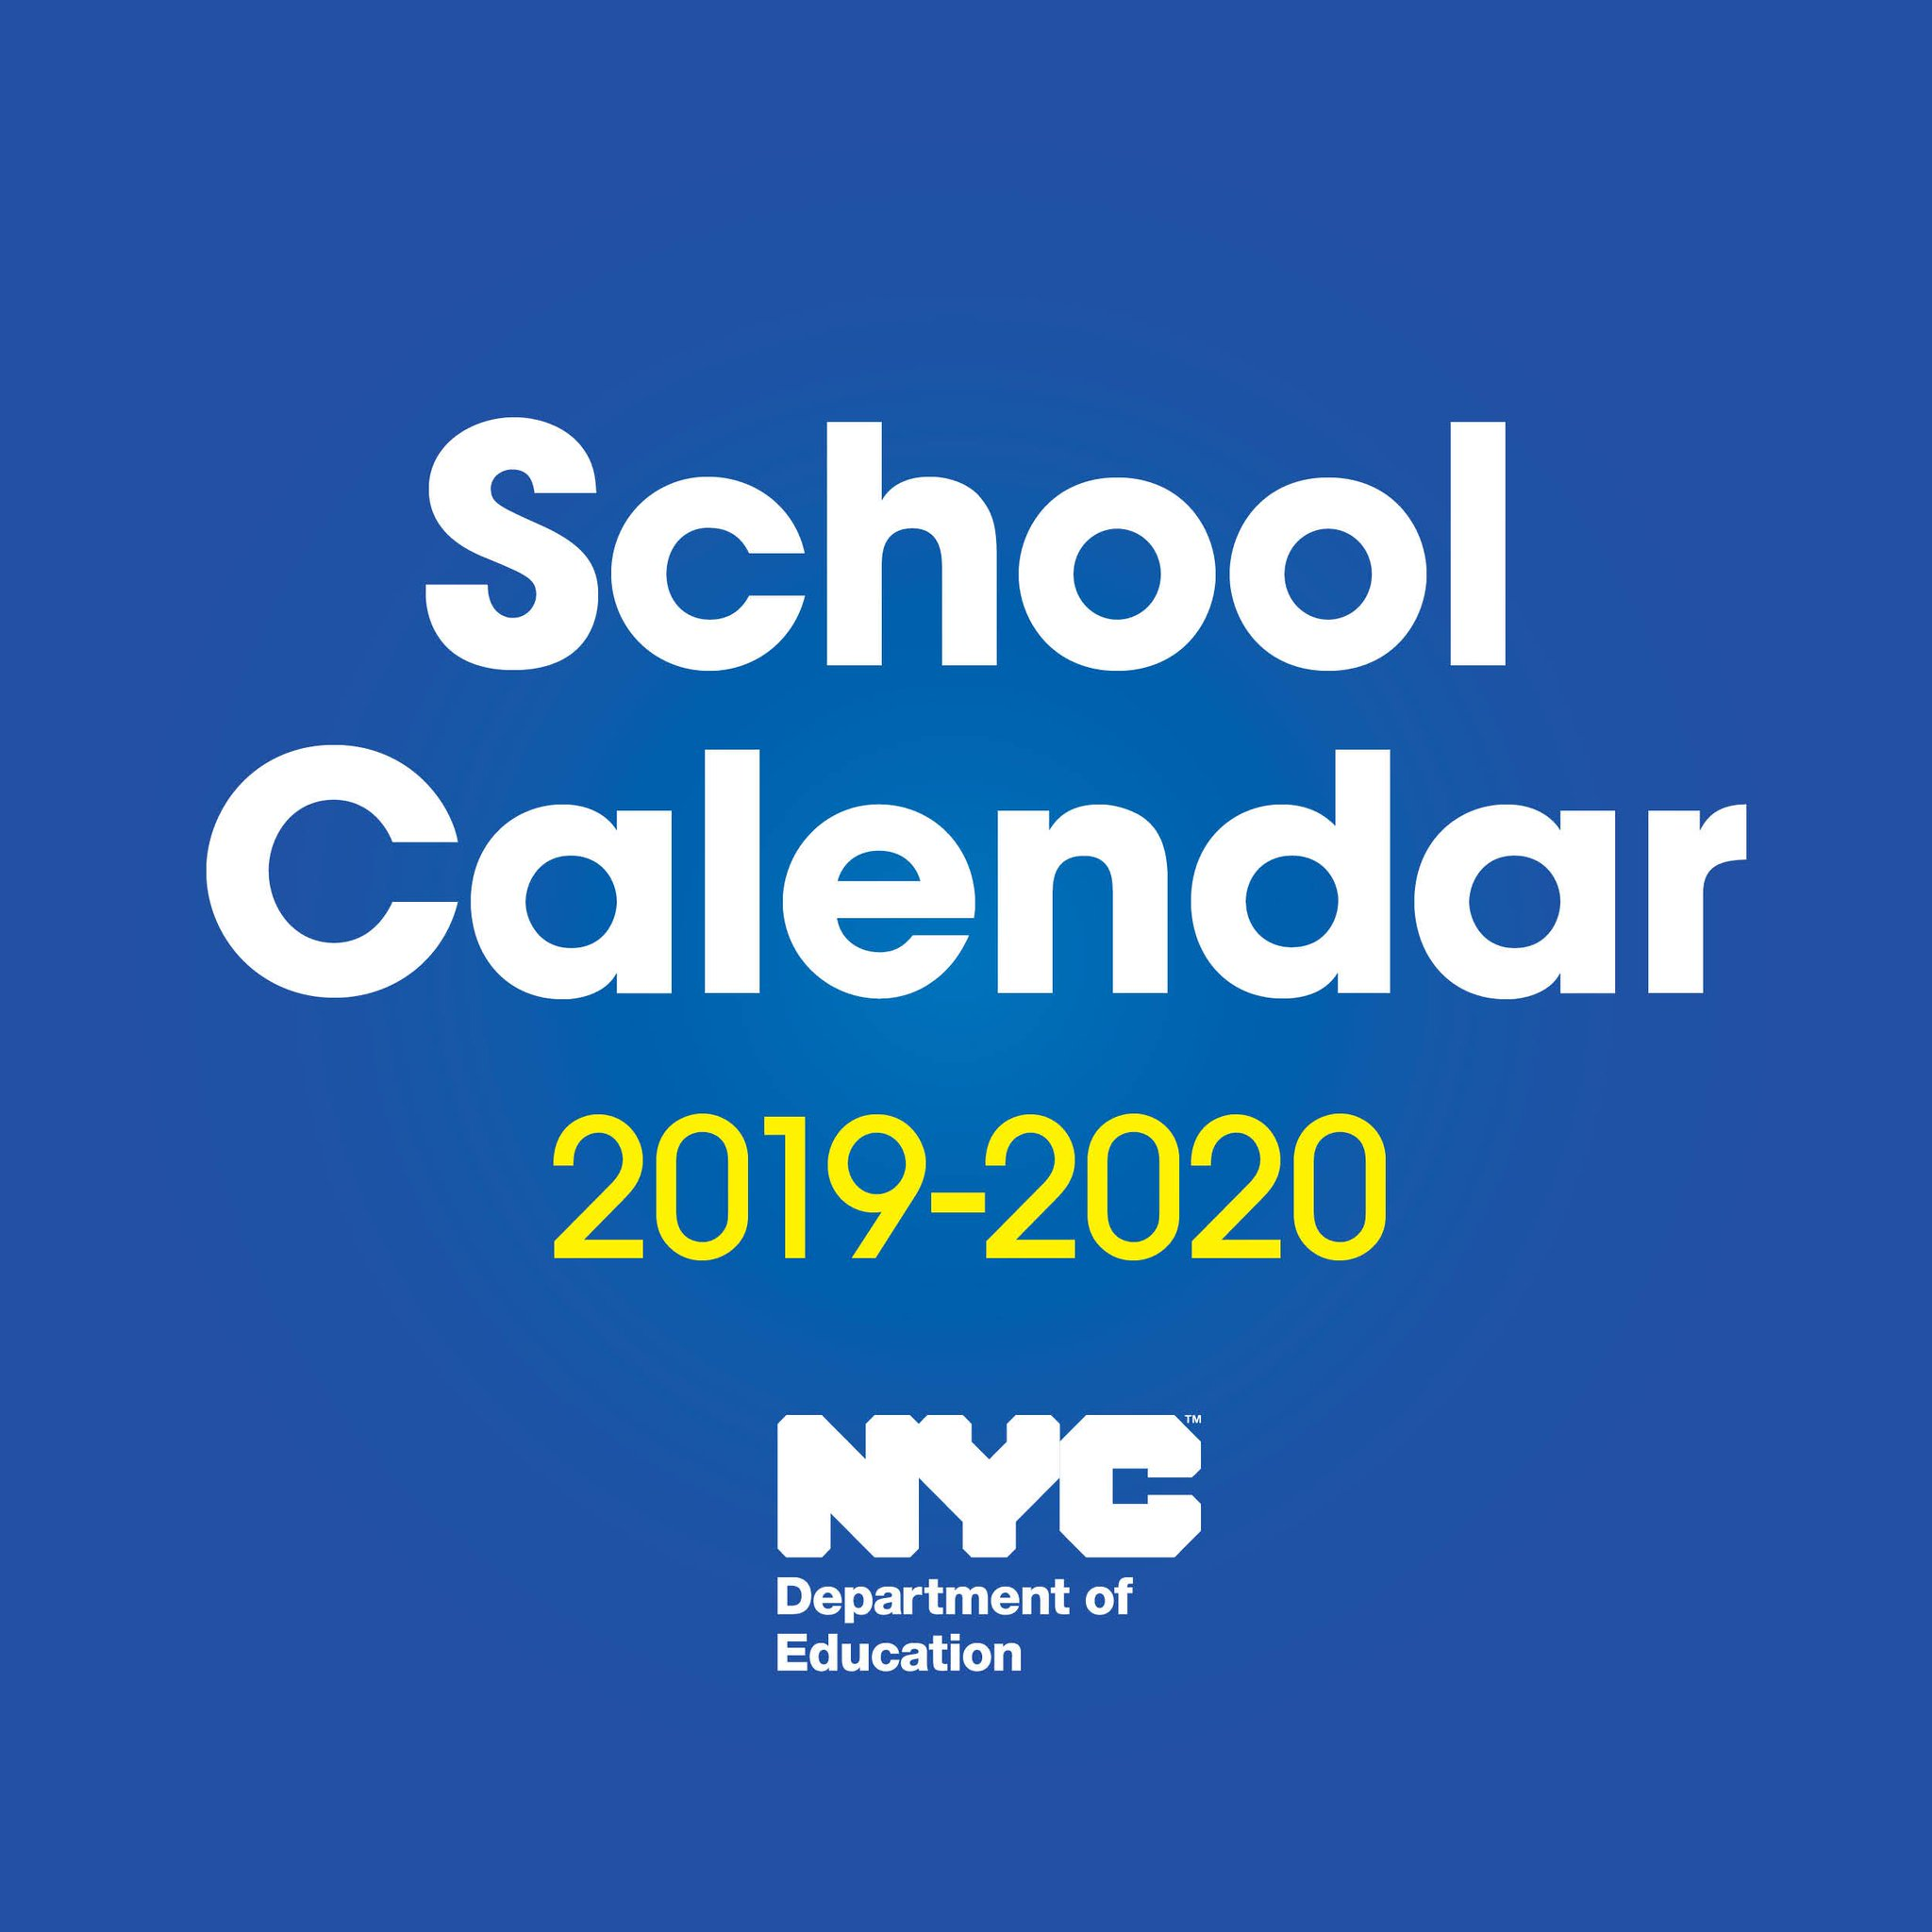 Nyc Public Schools Calendar 2020 NYC Public Schools on Twitter: